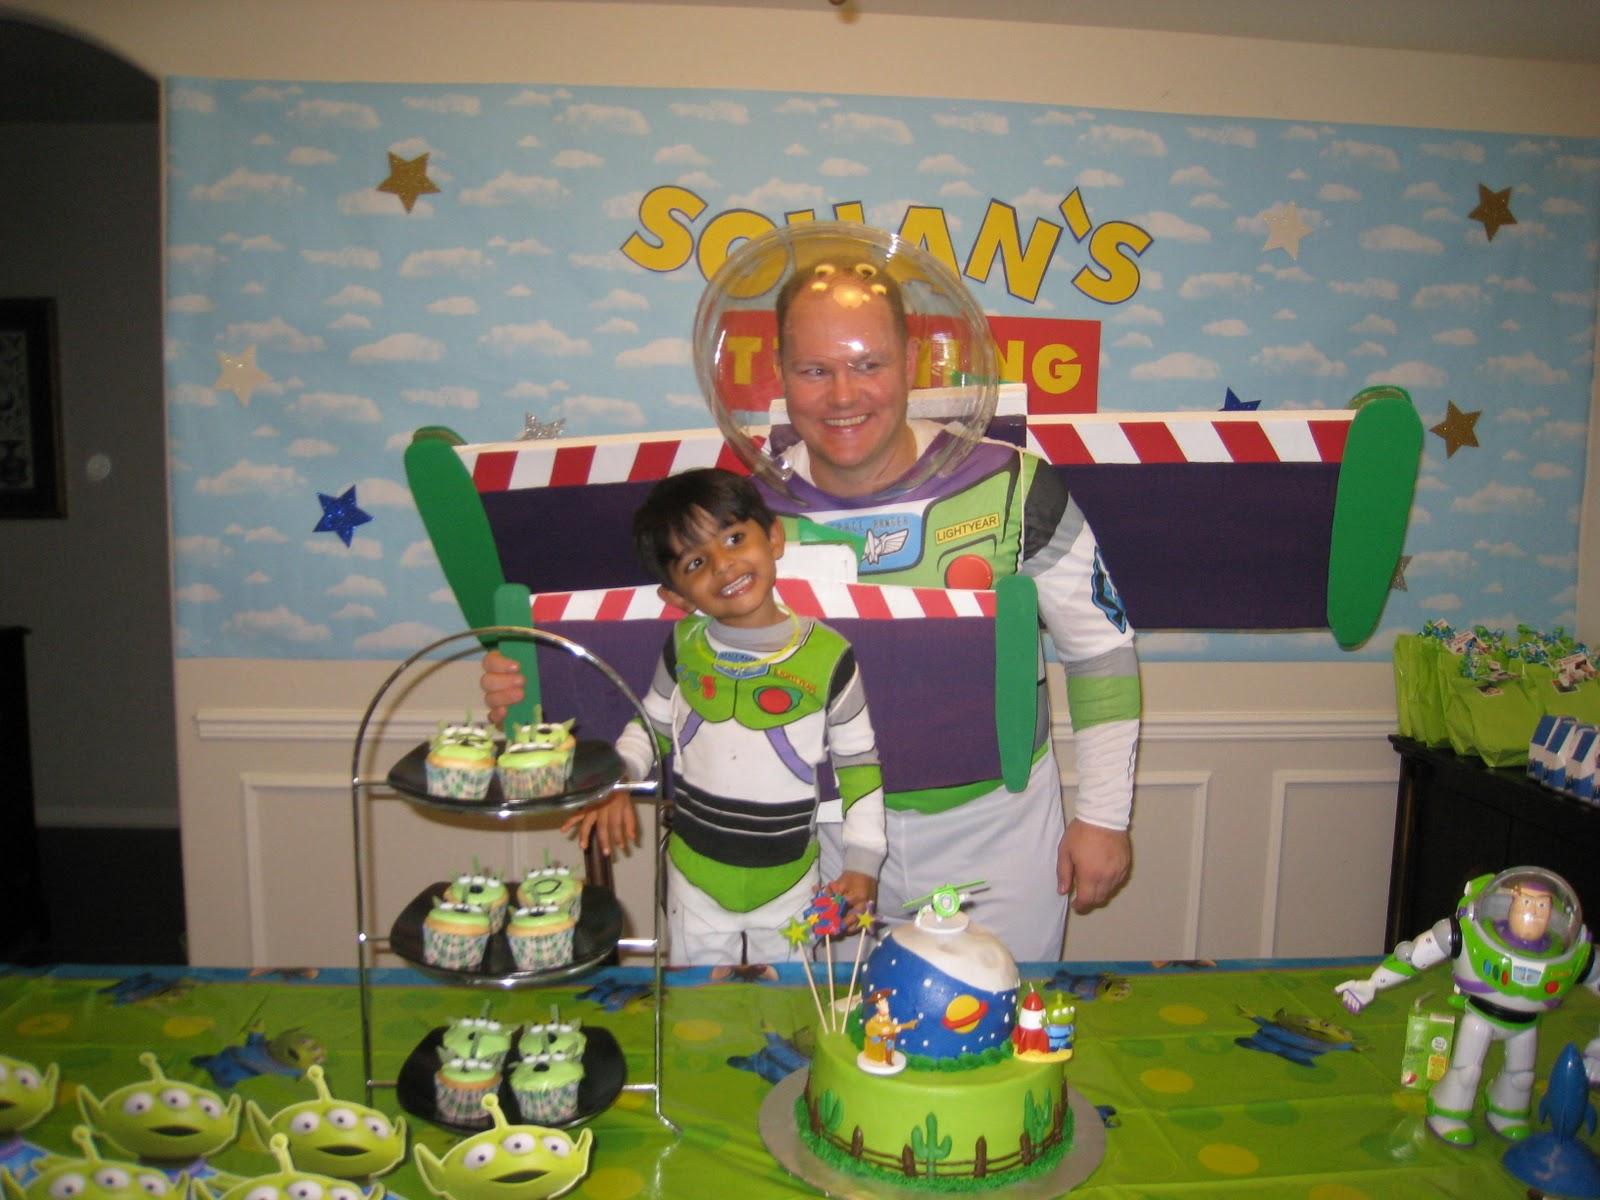 Pin Buzz Lightyear Edible Icing Image Cake